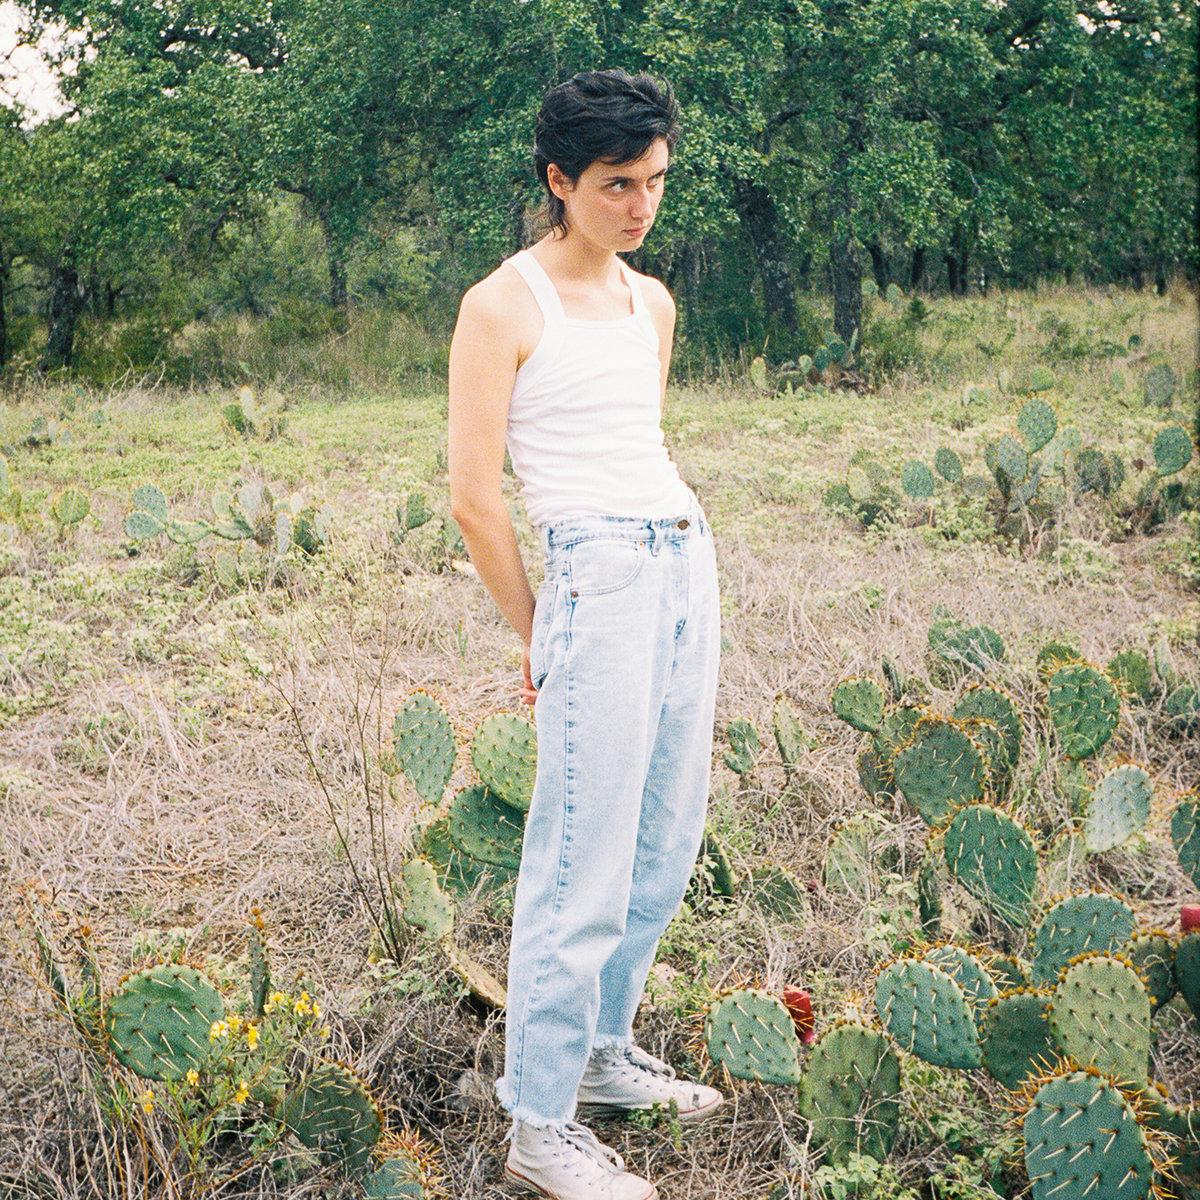 Katy Kirby - Cool Dry Place [LTD LP]